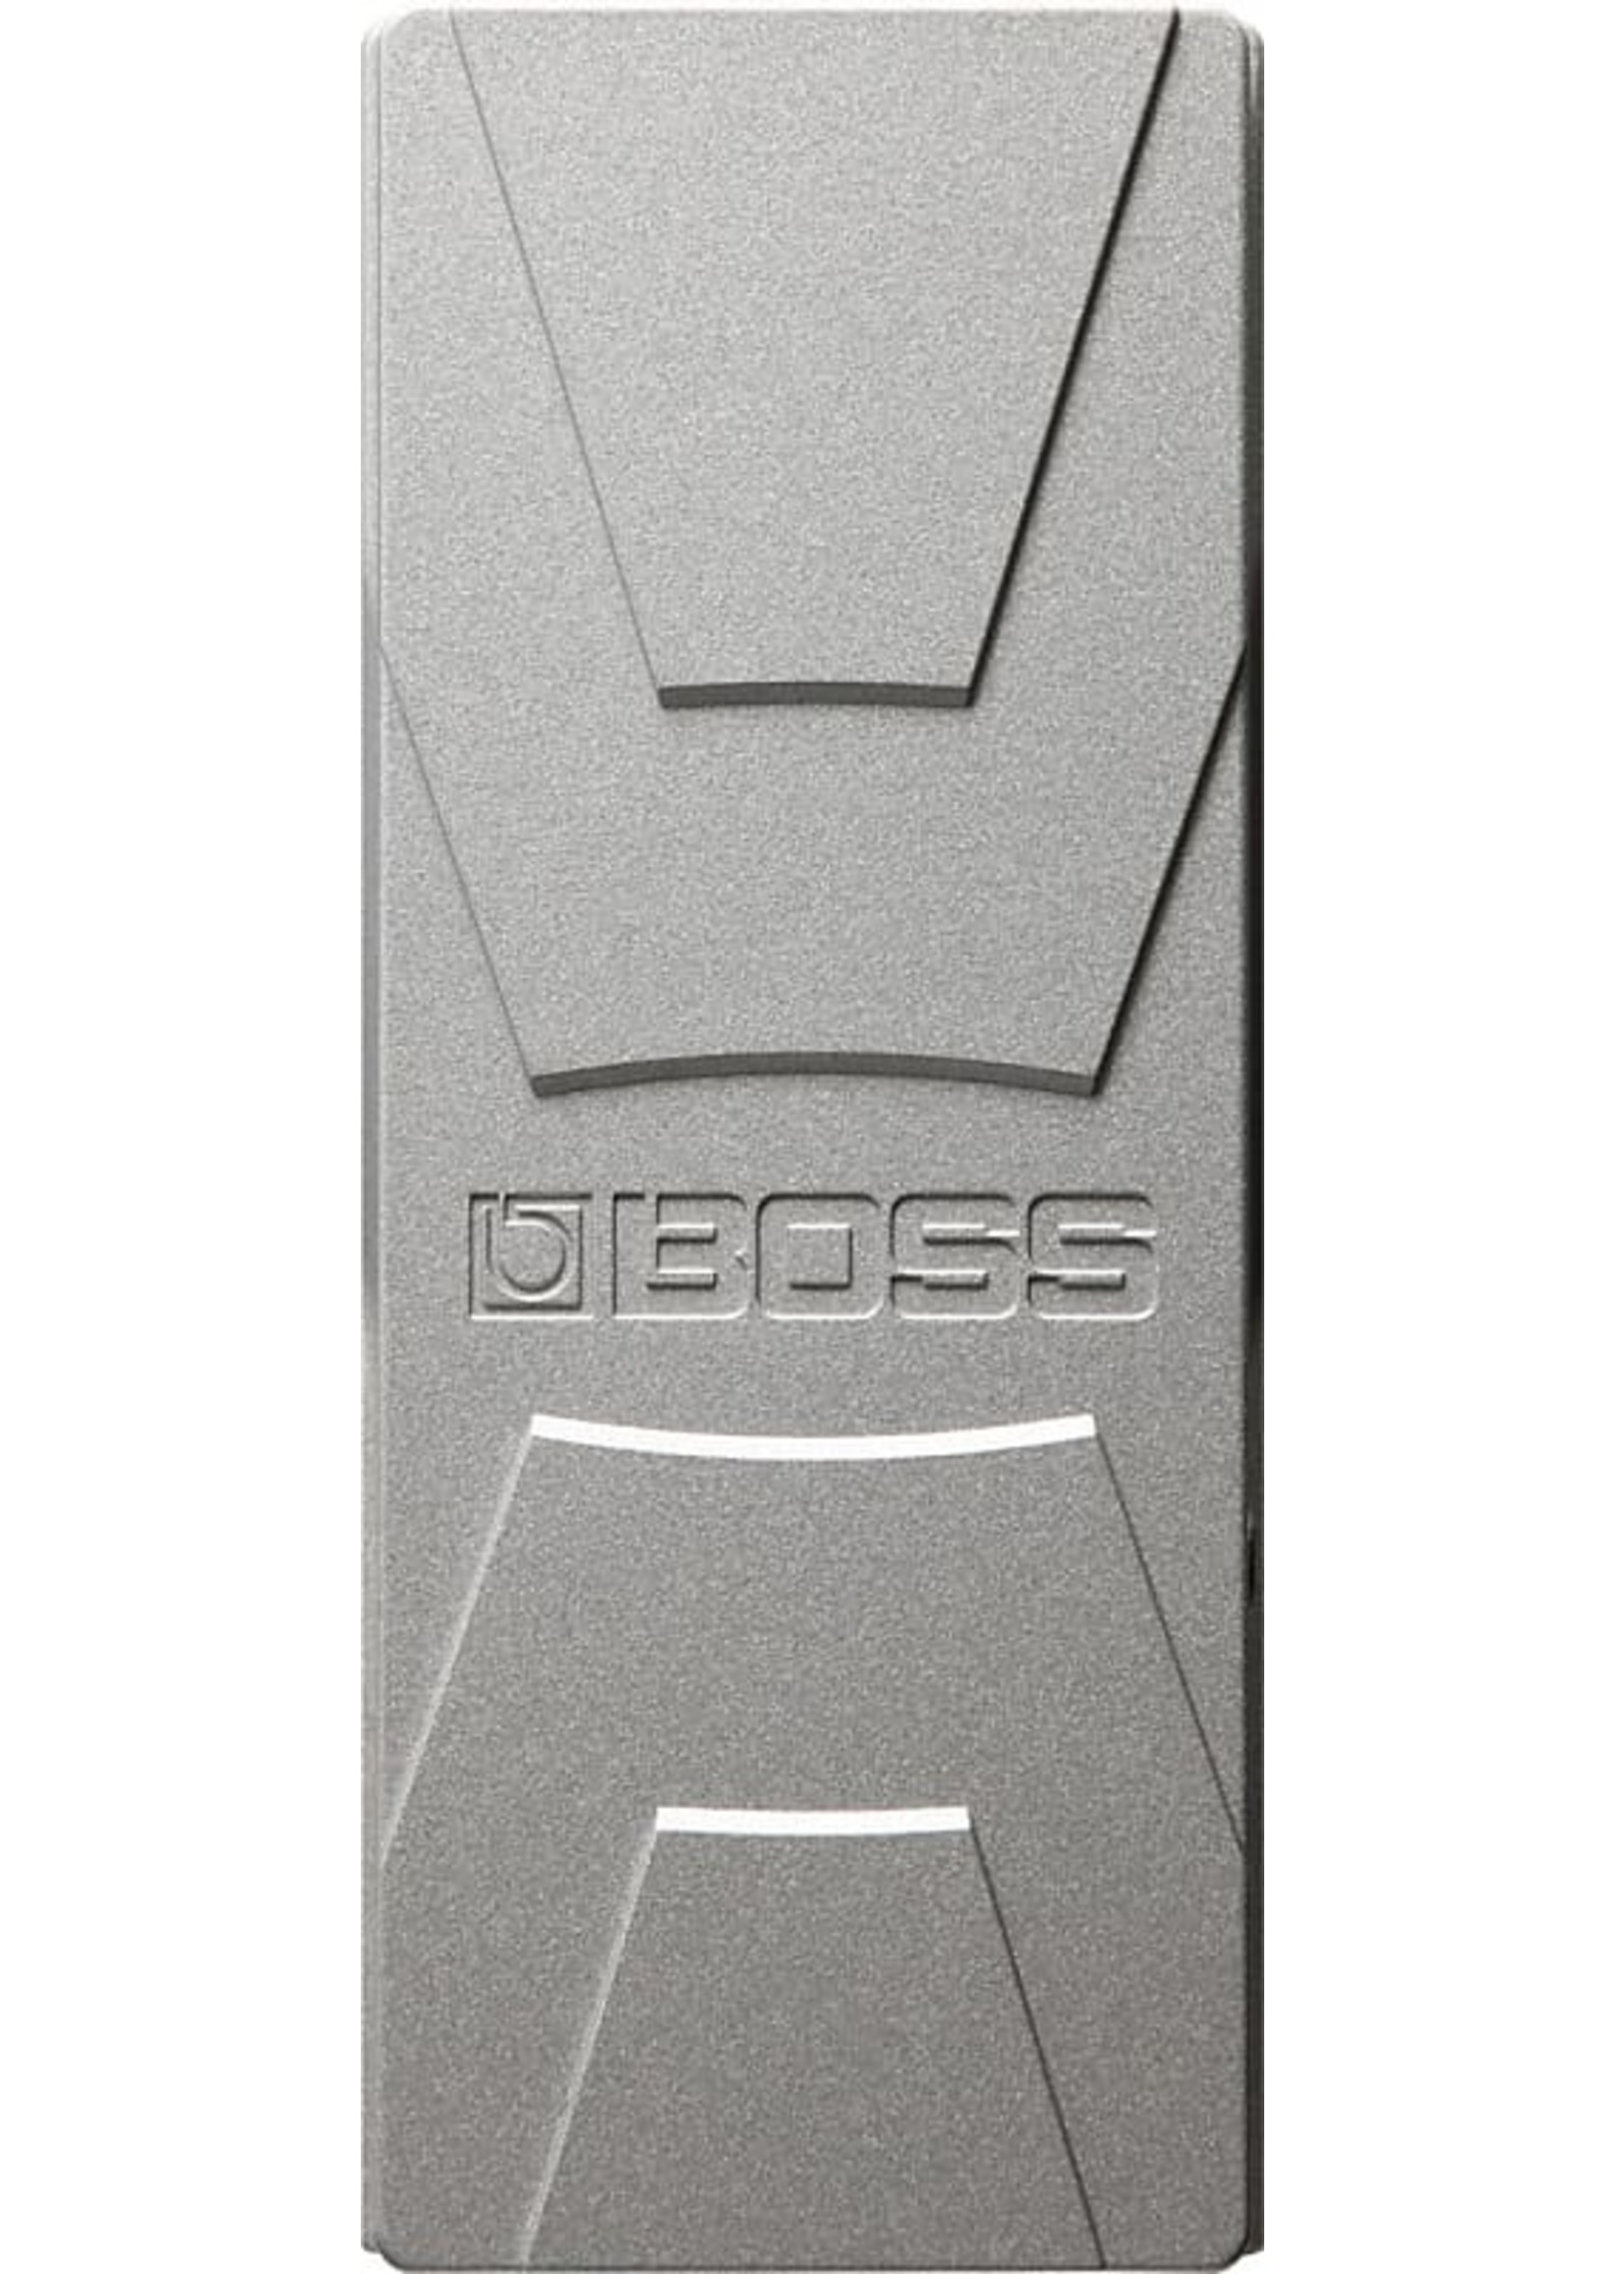 Boss Boss FV-30H Volume Pedal High Impedance